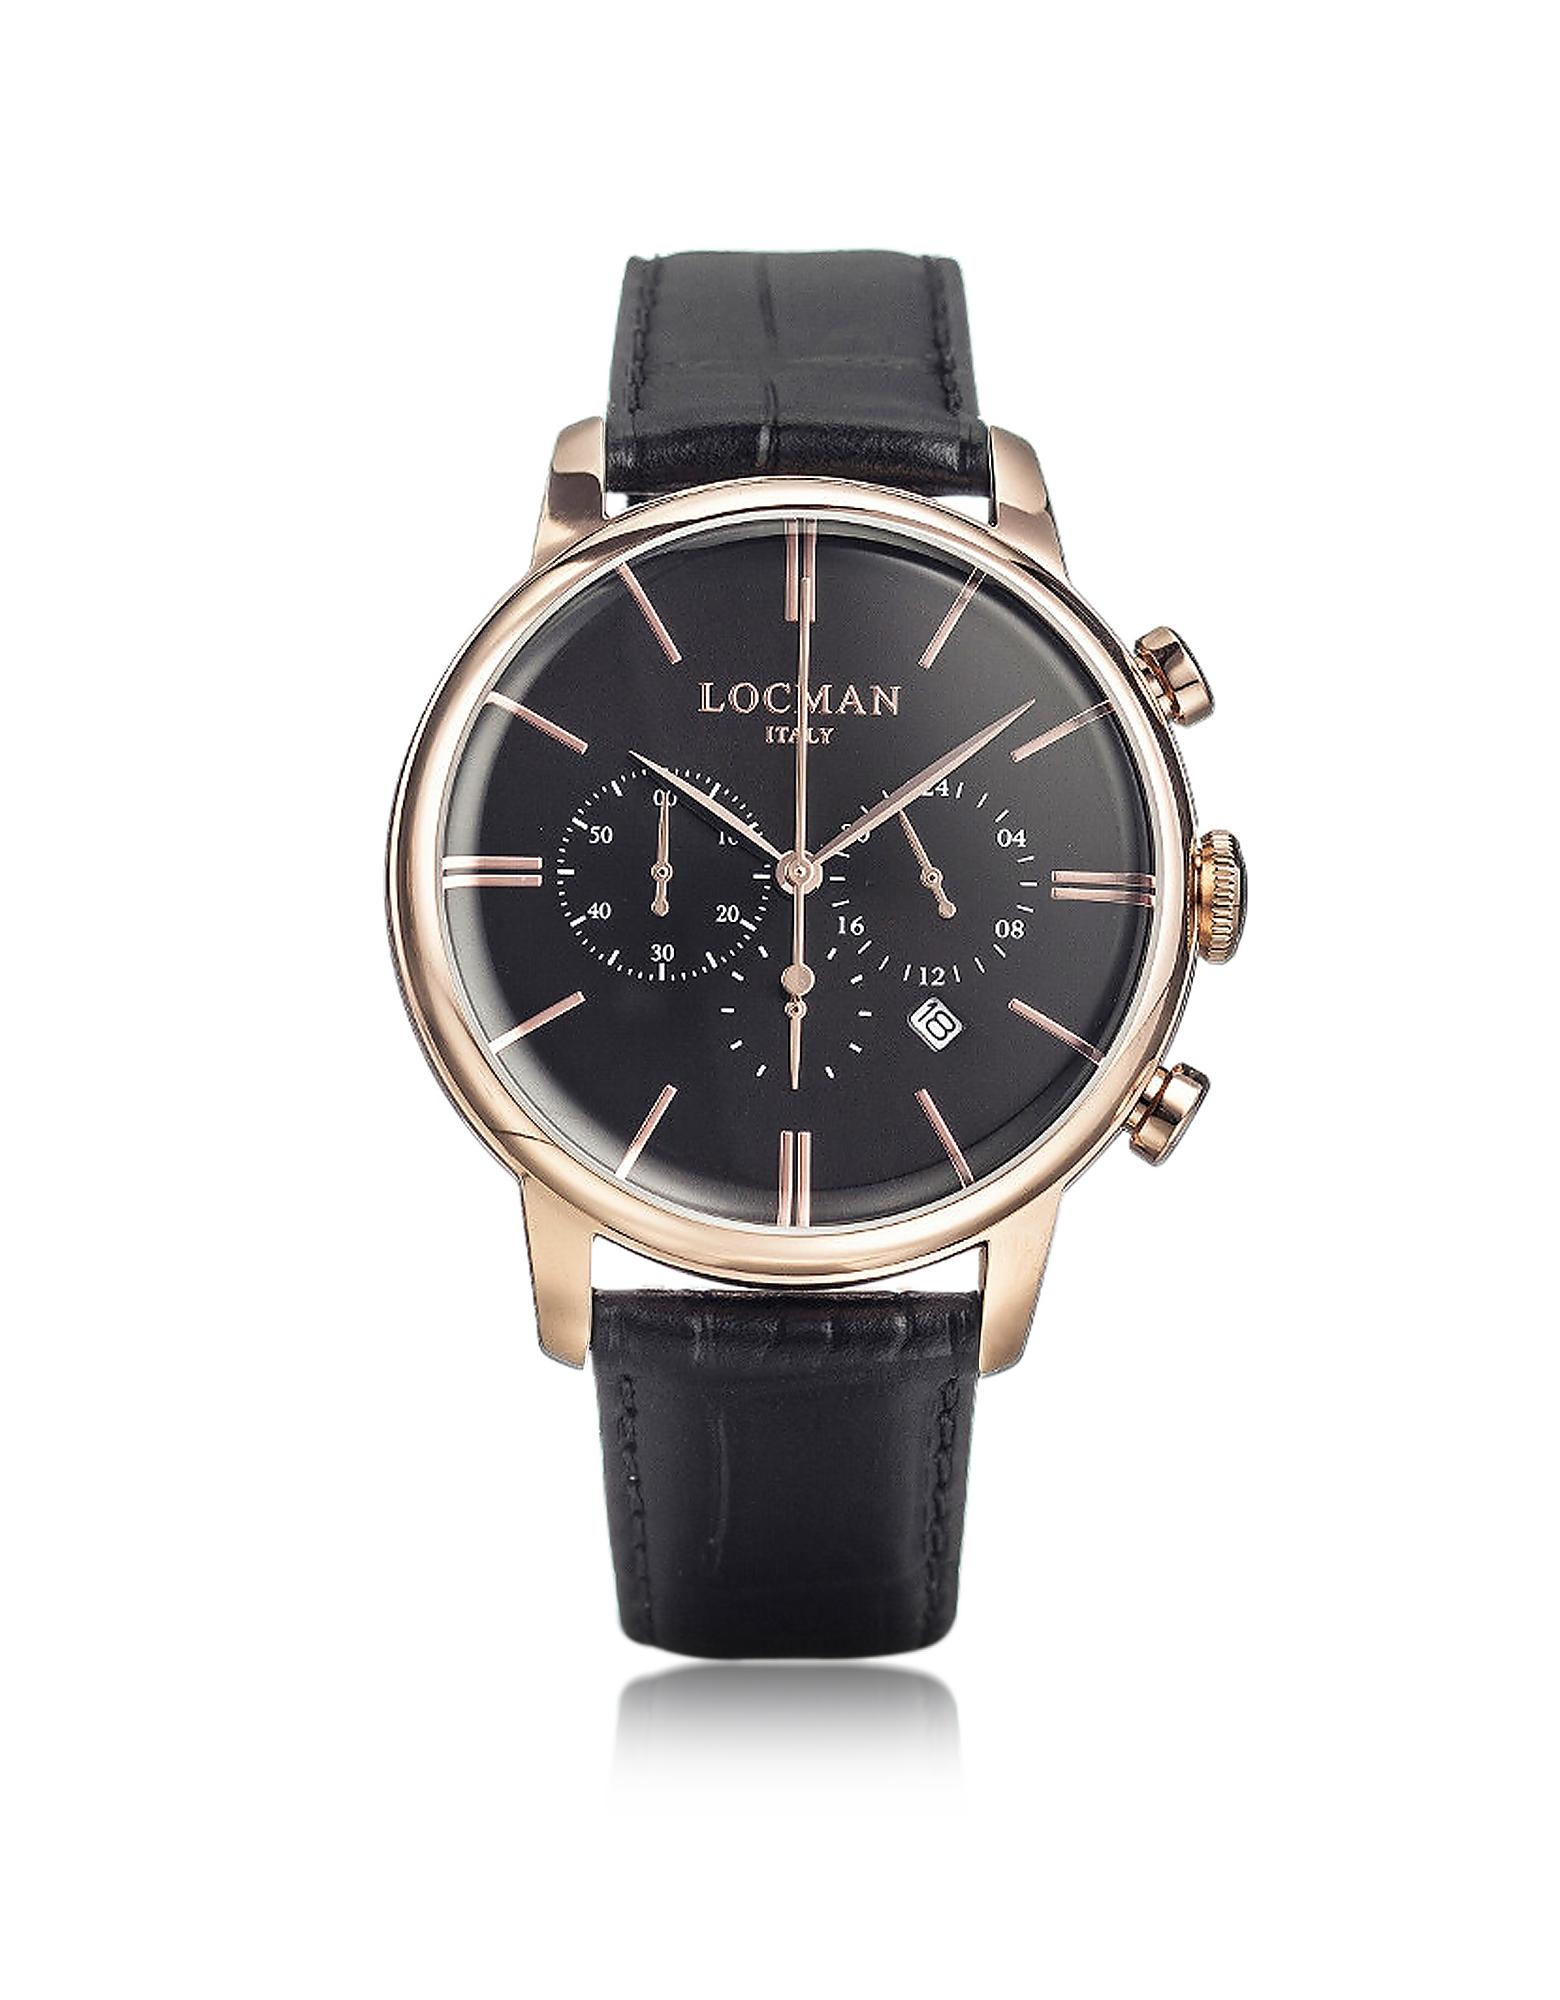 Locman Men's Watches, 1960 Rose Gold PVD Stainlees Steel Men's Chronograph Watch w/Black Strap